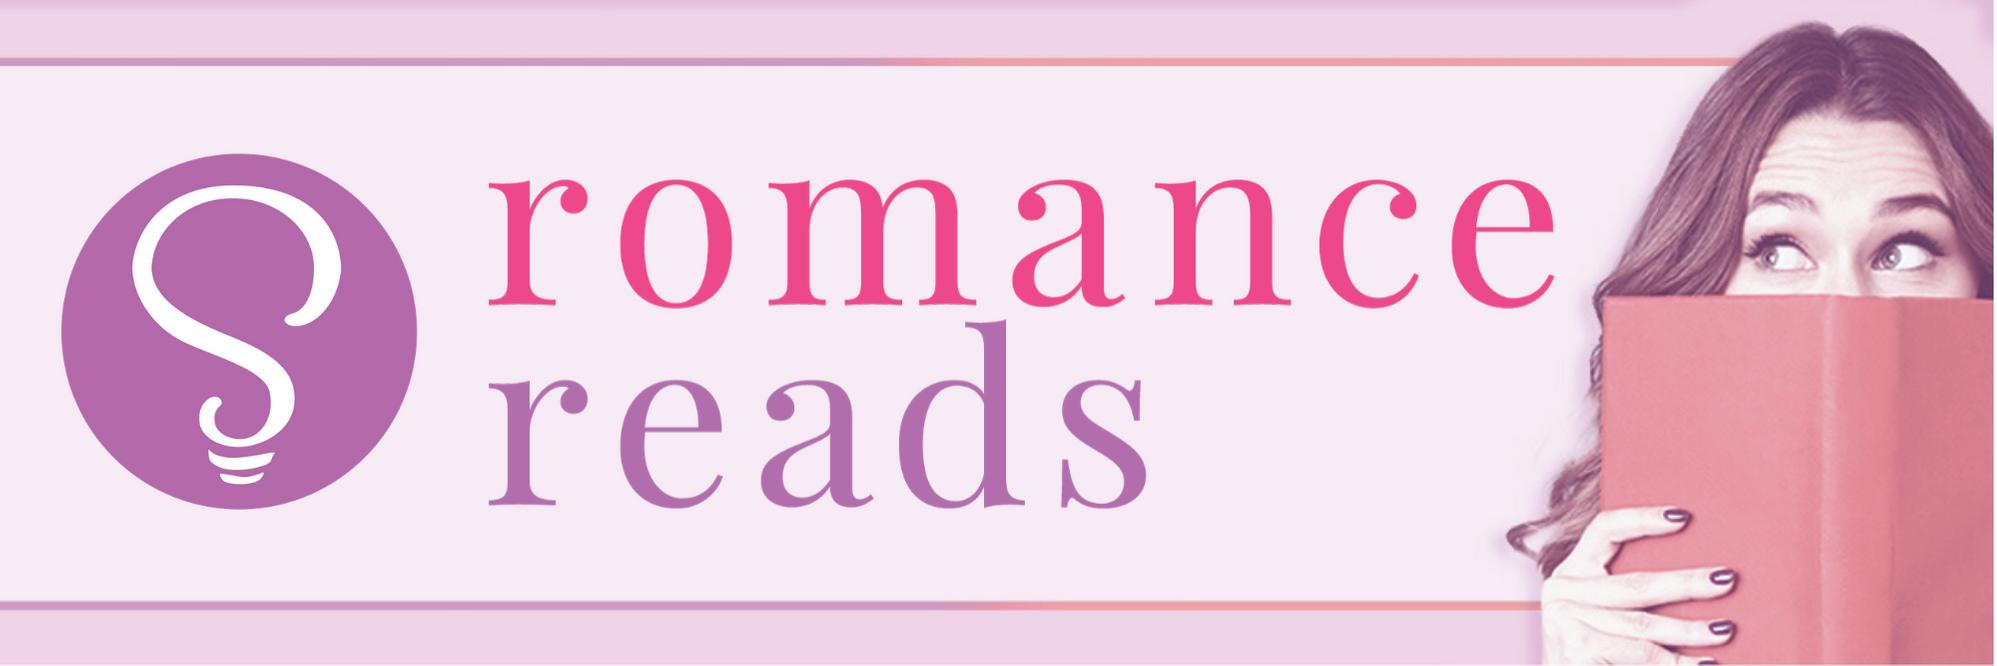 Romance Reads by Sourcebooks Casablanca